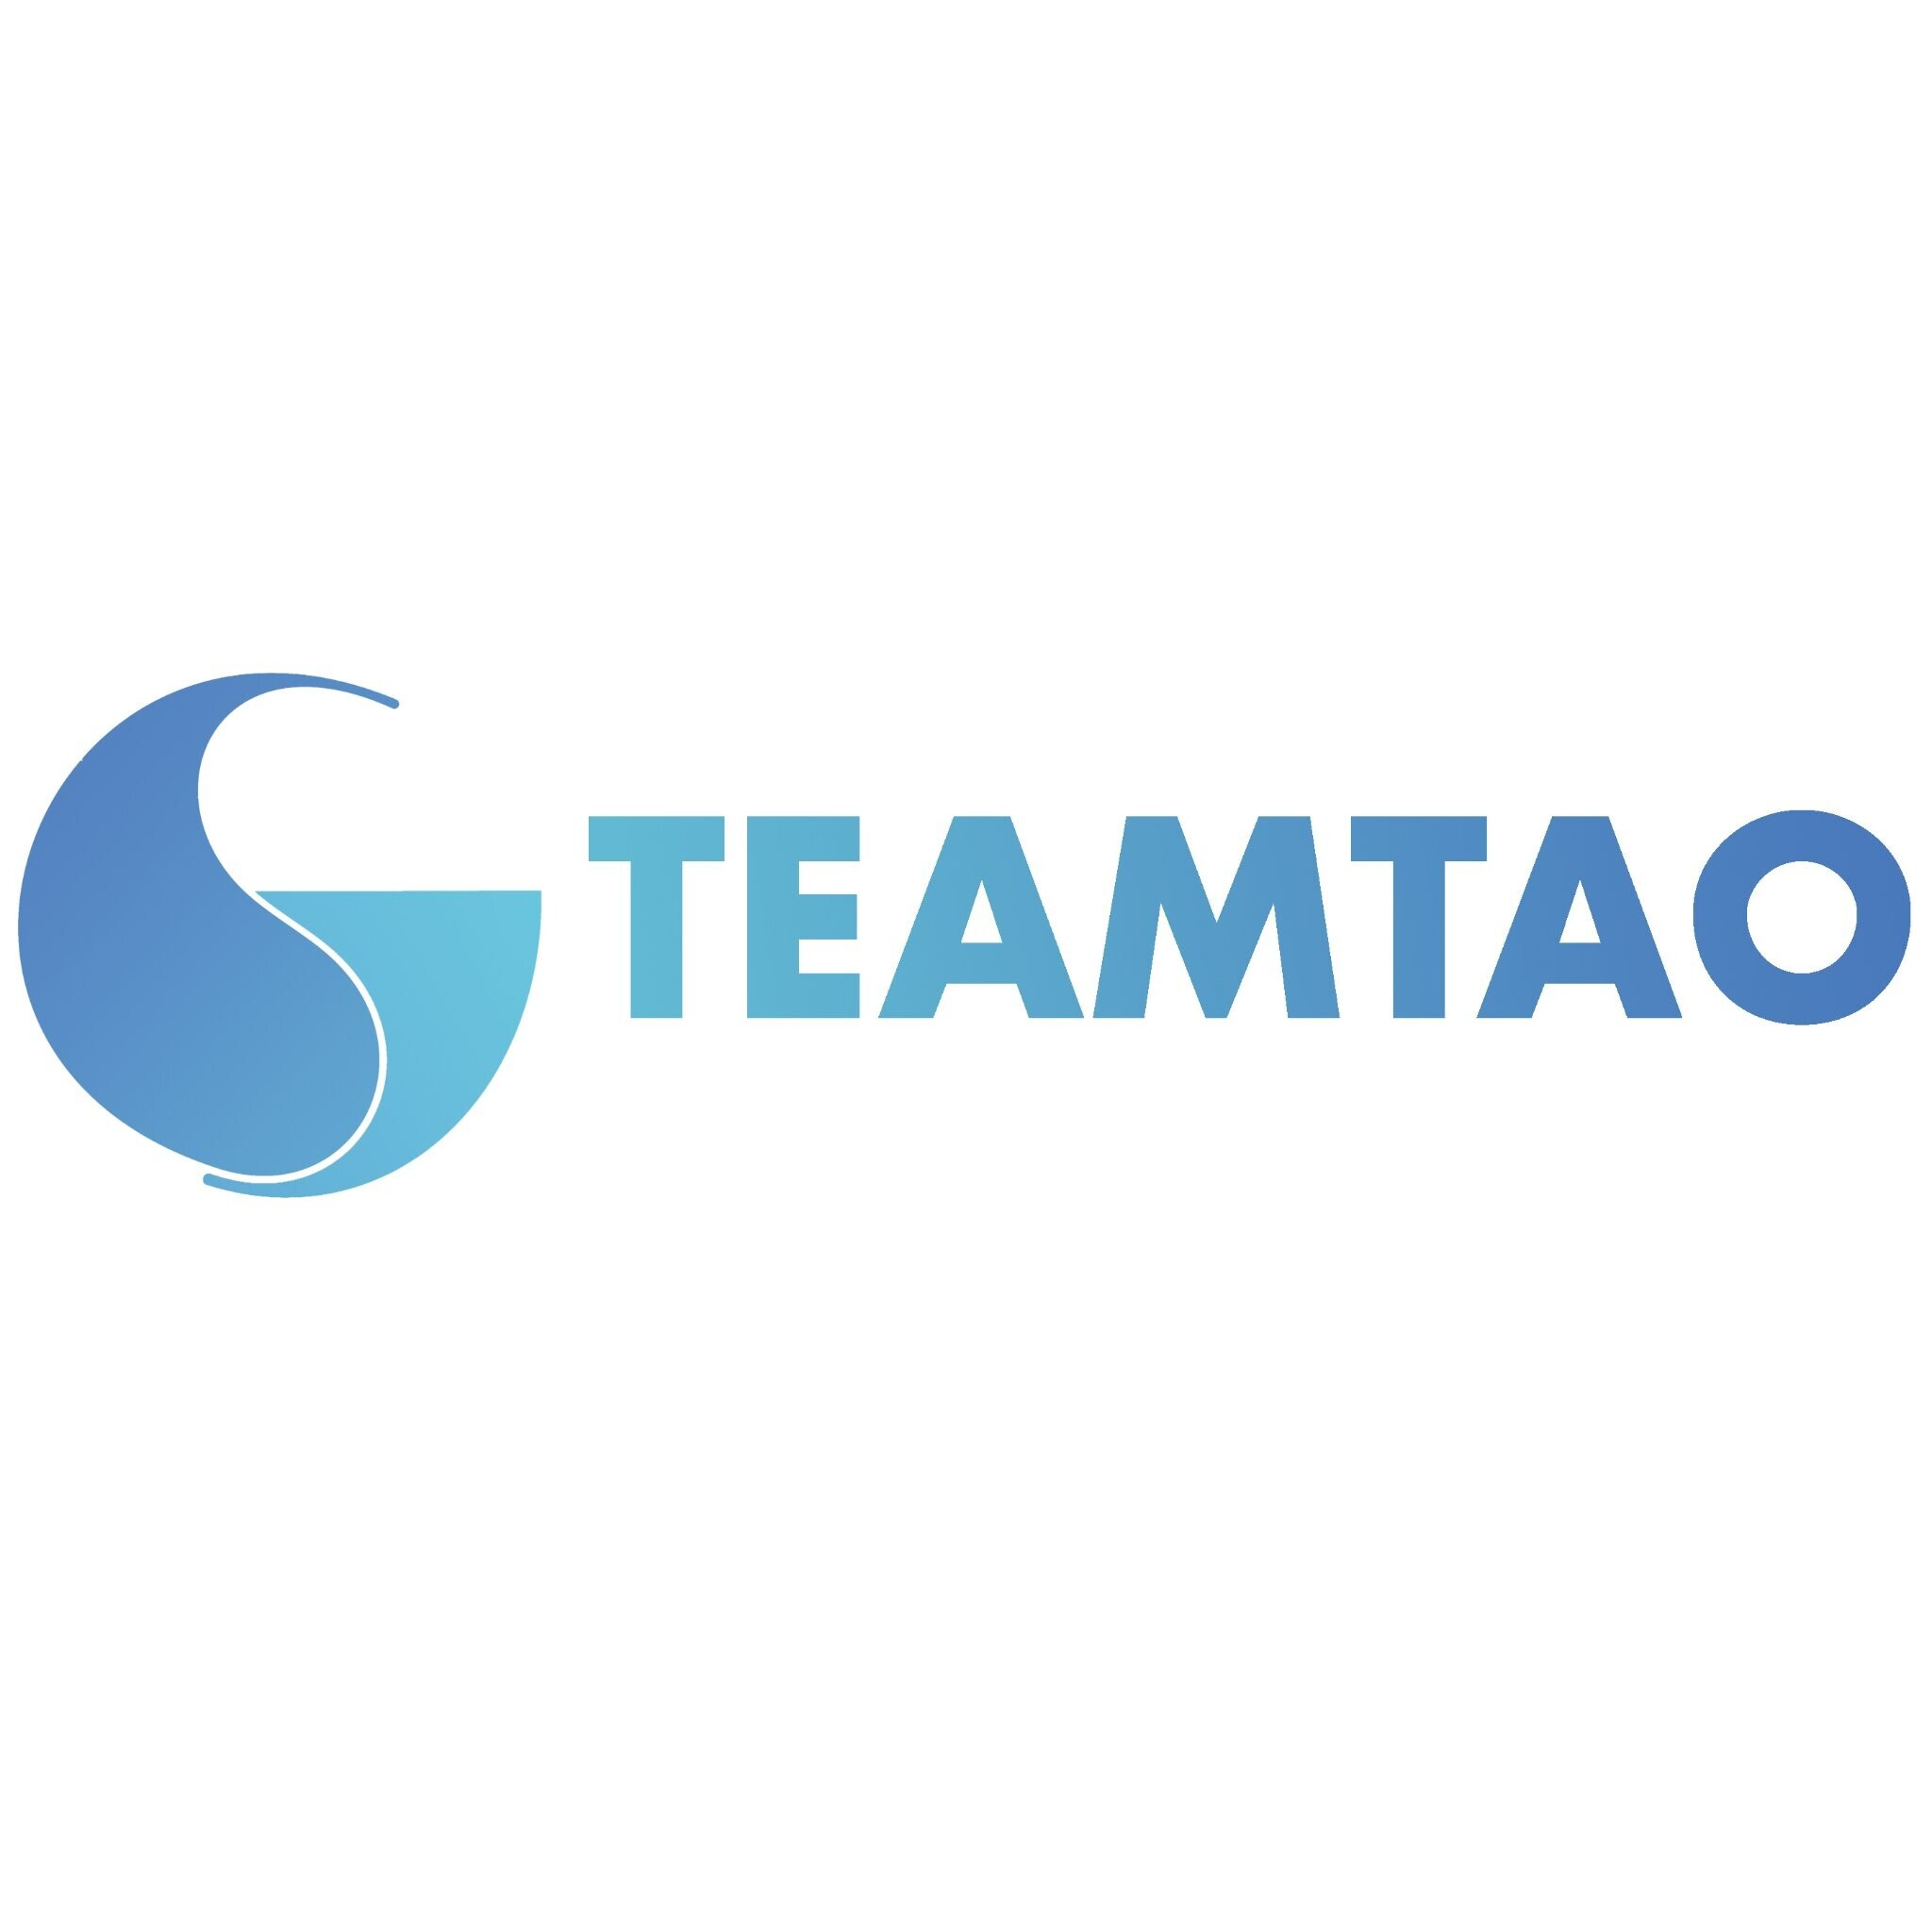 TeamTao